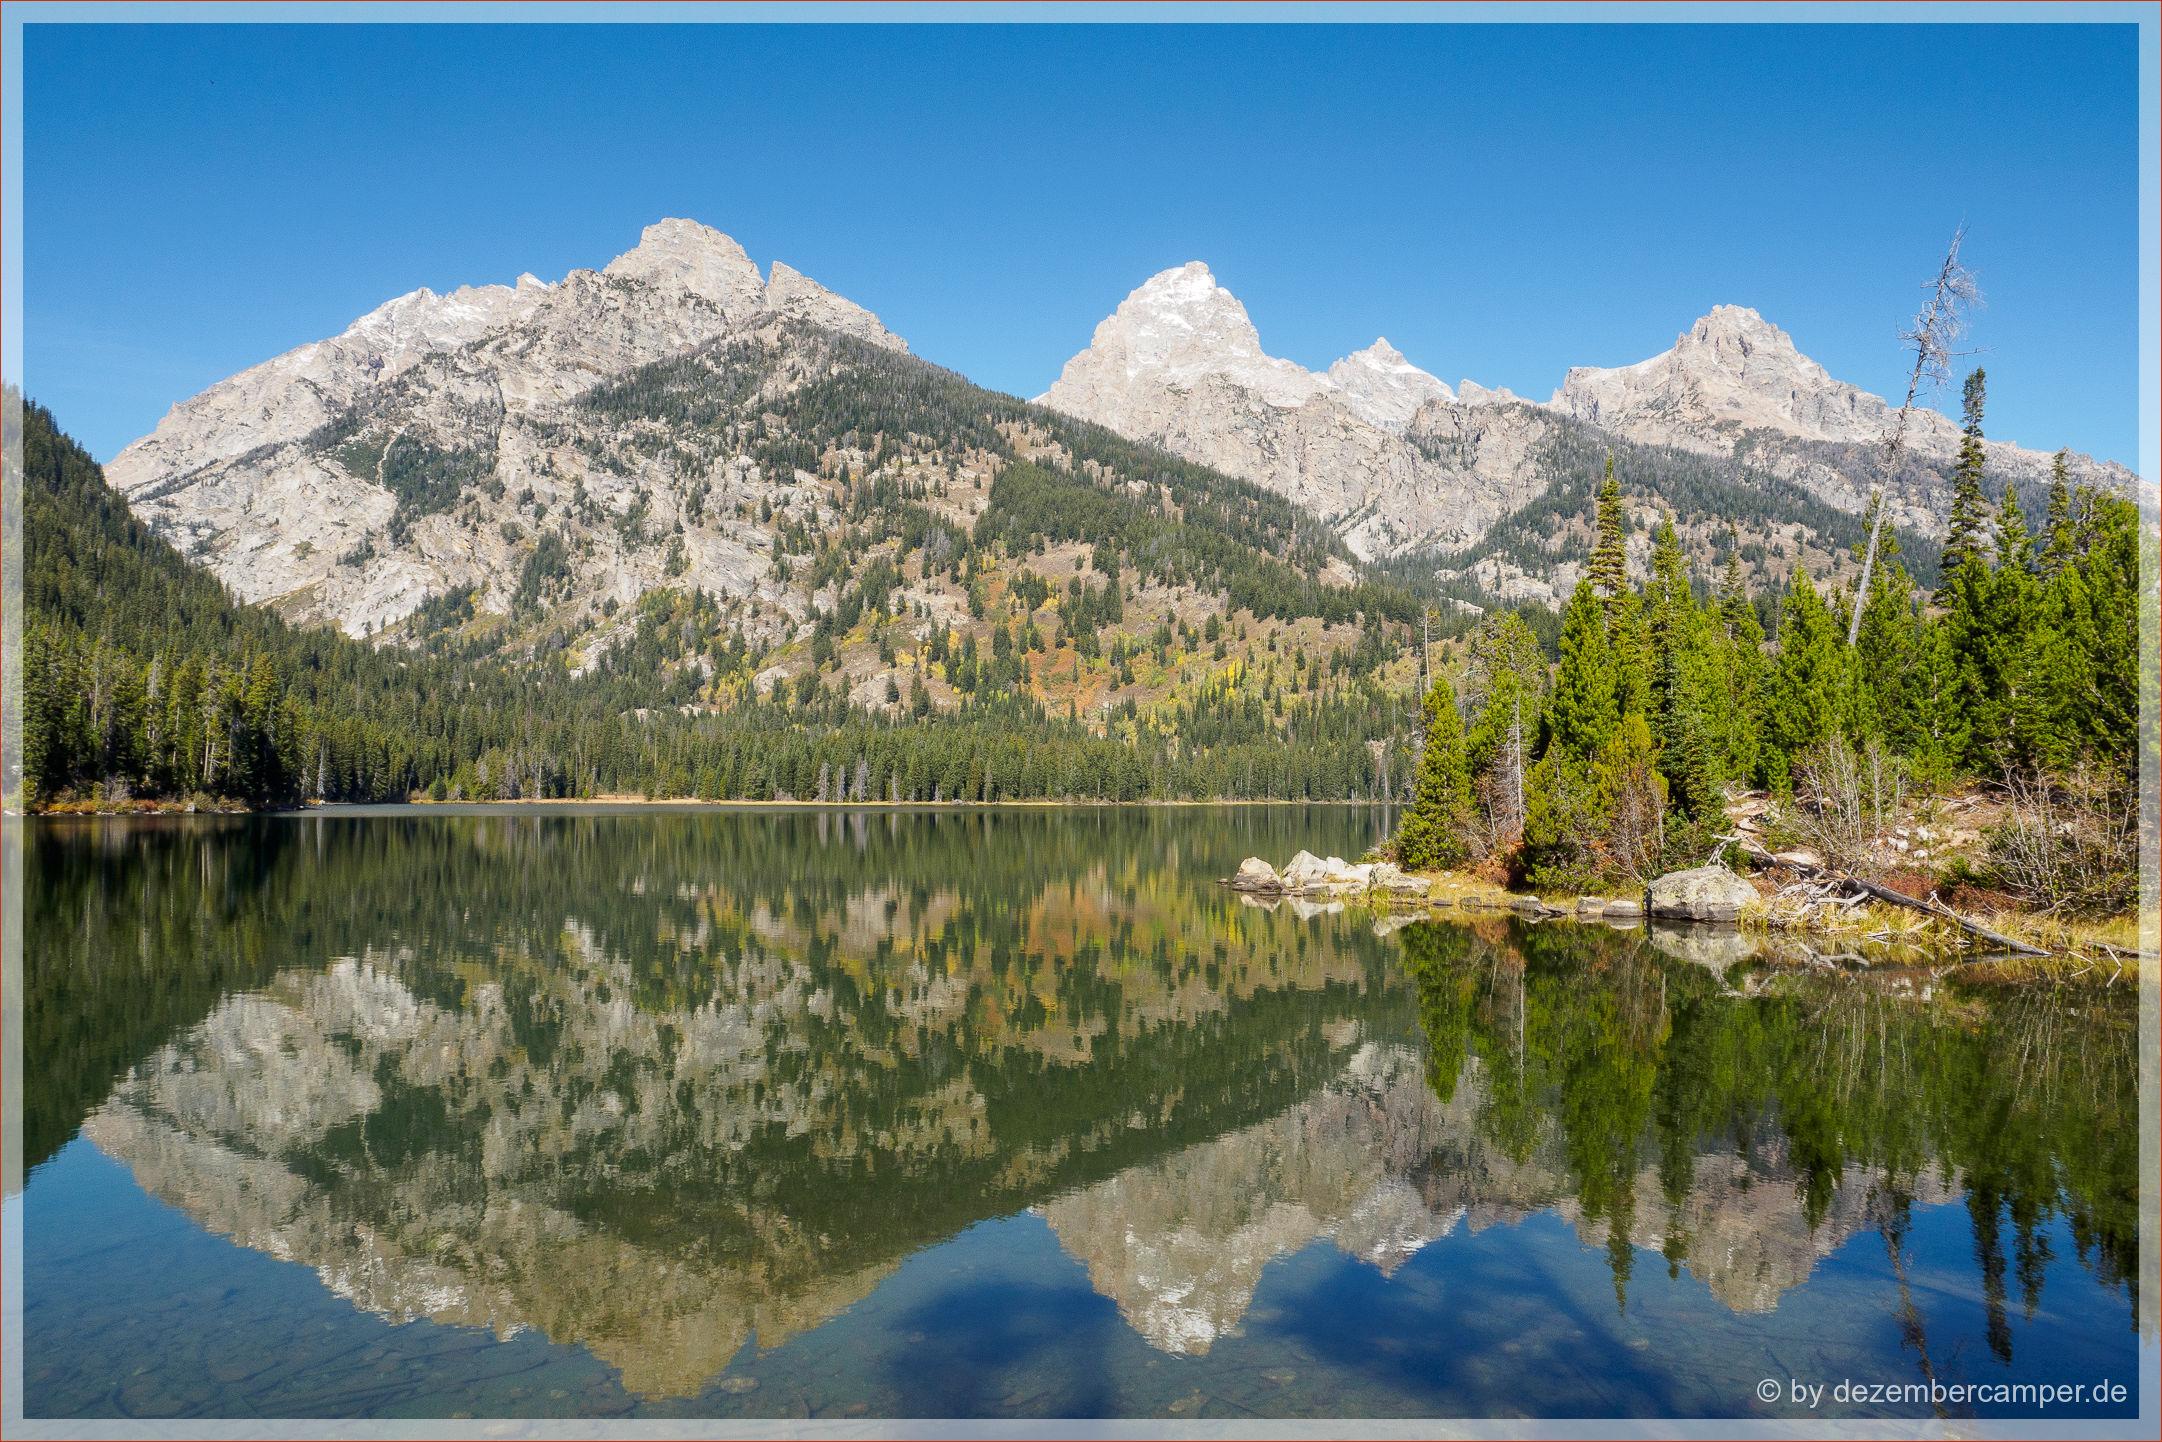 Grand Teton NP - Taggart Lake